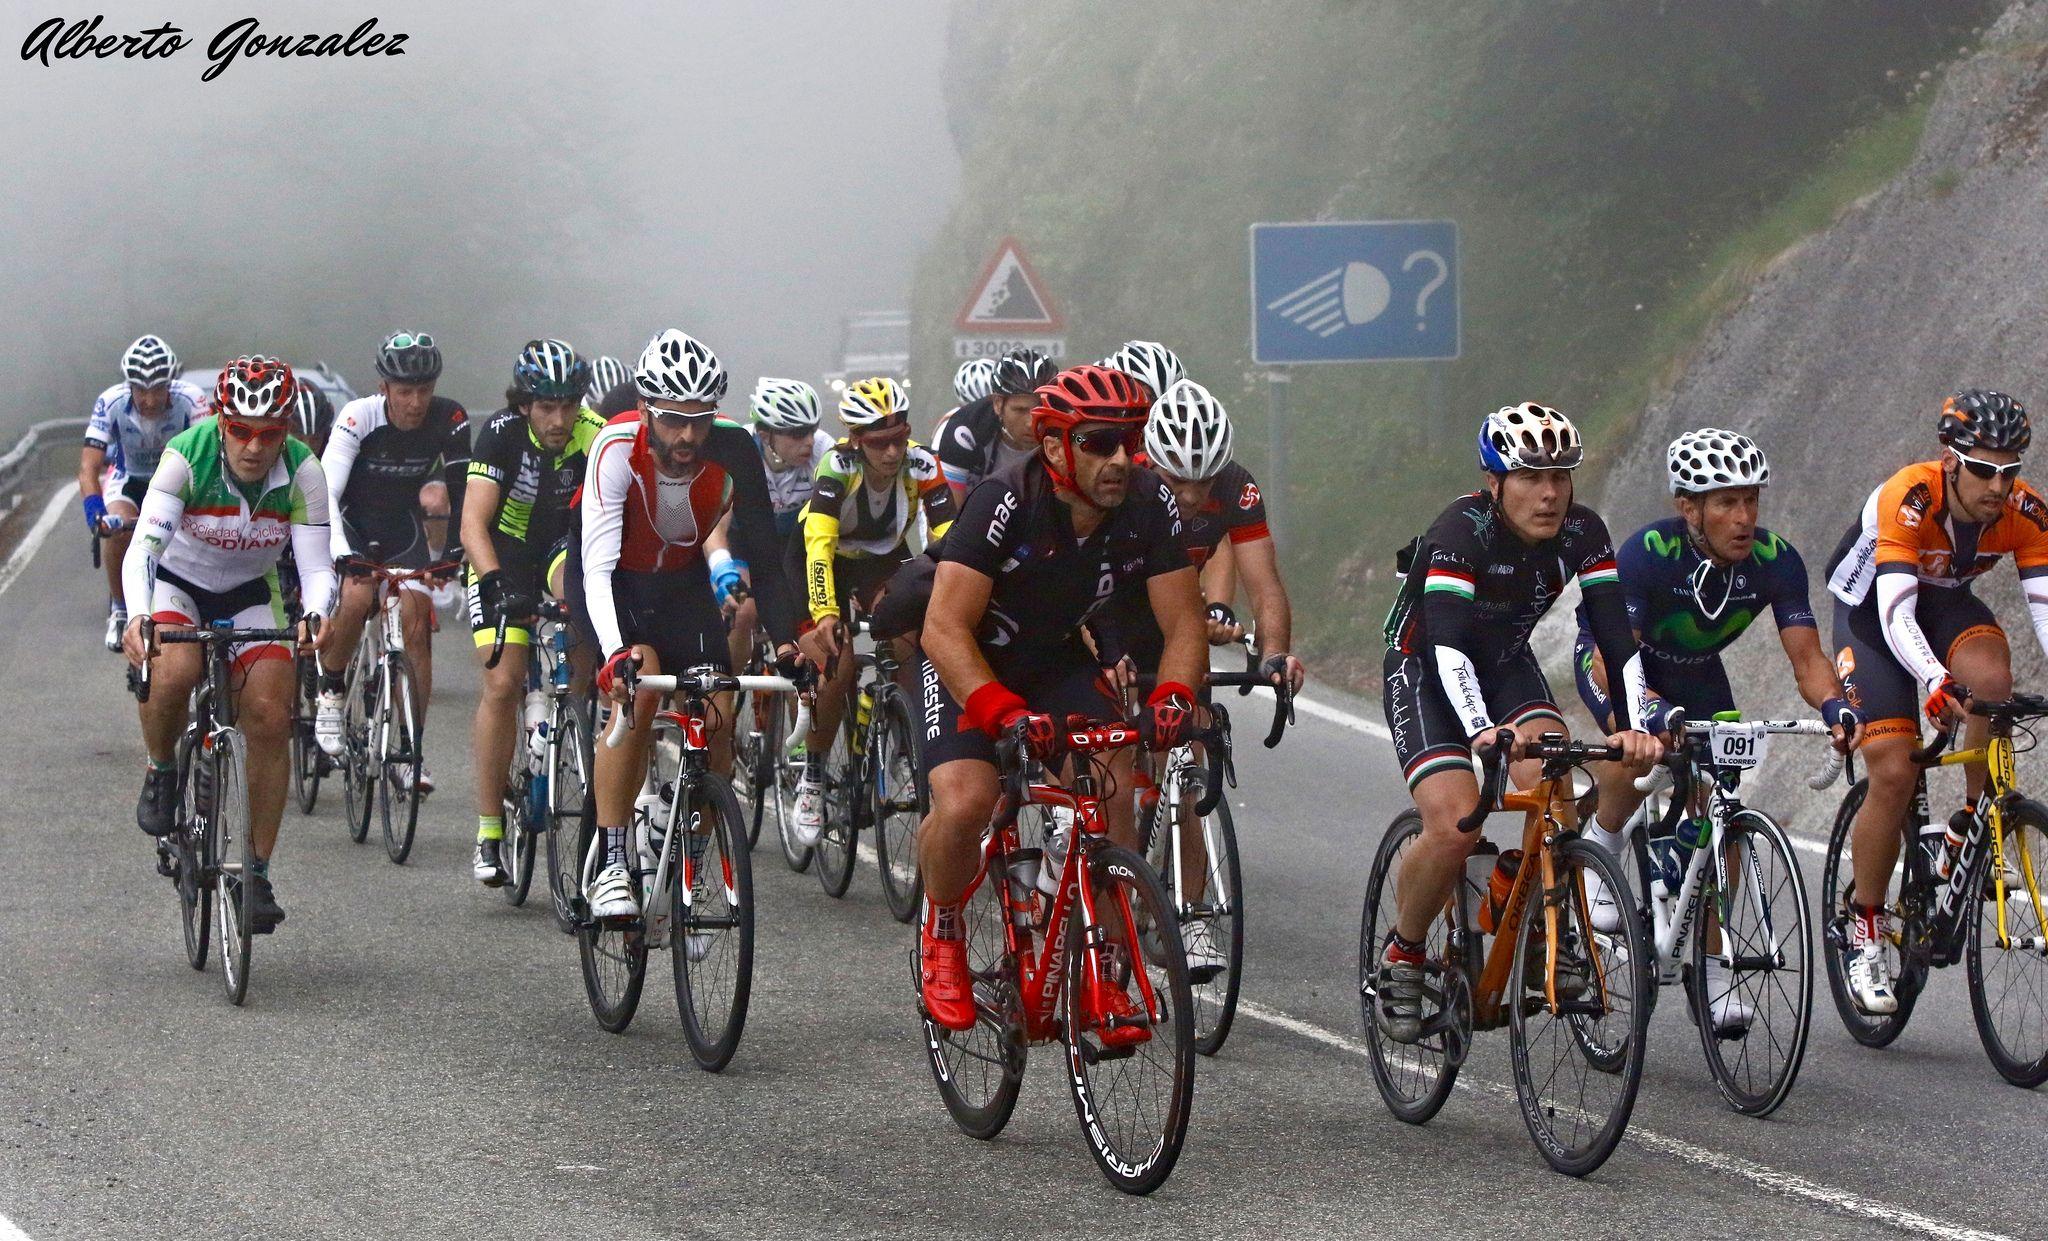 https://flic.kr/p/tL2iw5 | cicloturista de vitoria - gazteiz